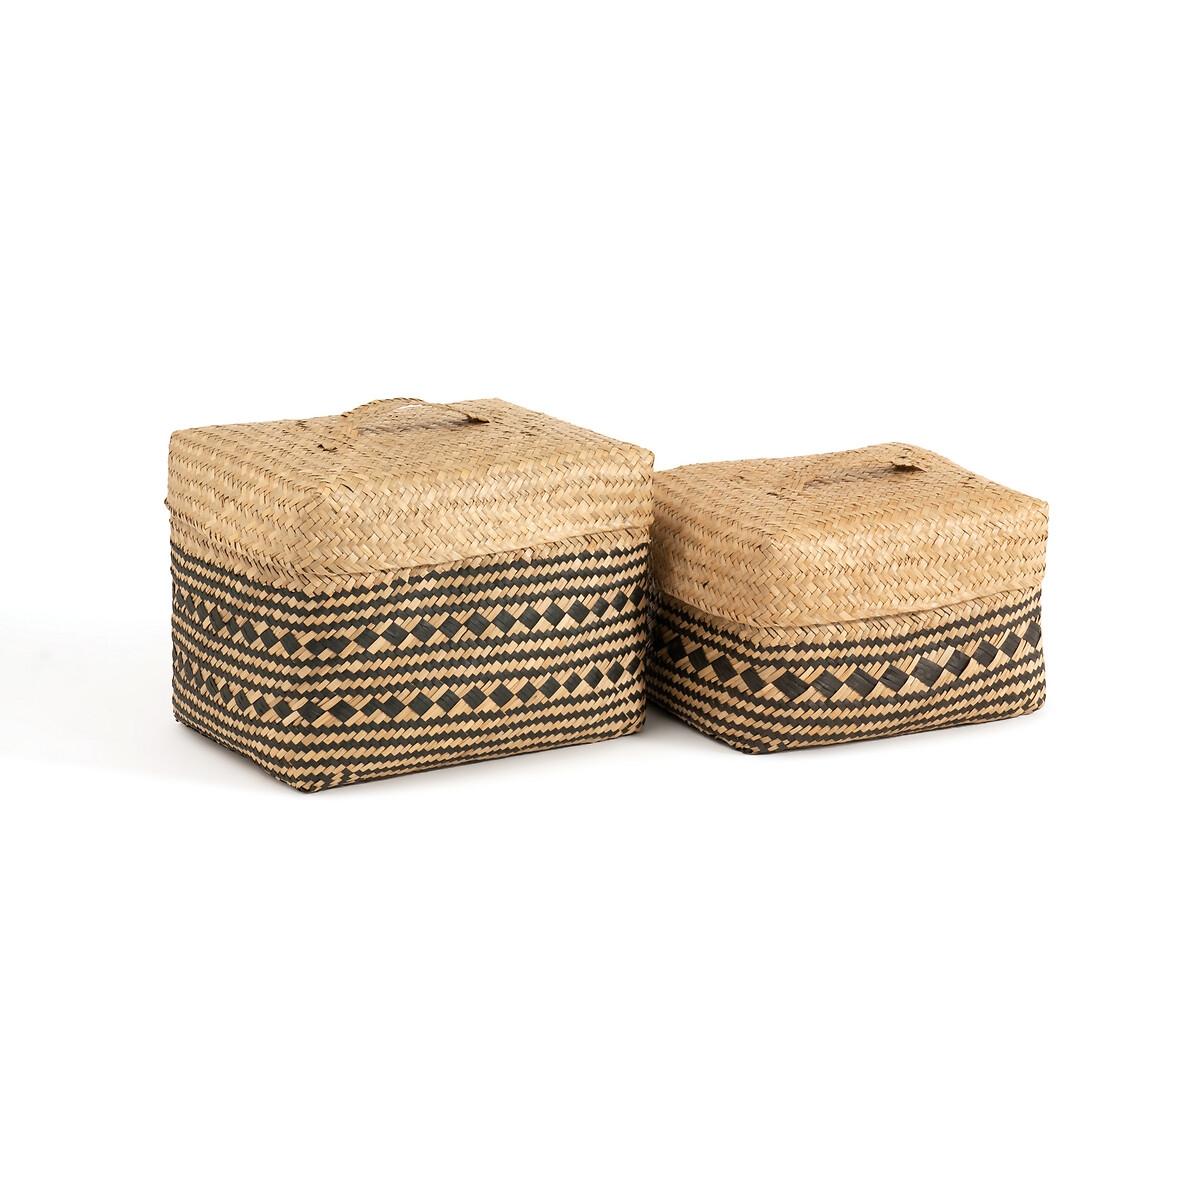 Комплект из 2 корзин, Kotak LaRedoute La Redoute единый размер бежевый бейсболка laredoute la redoute единый размер синий